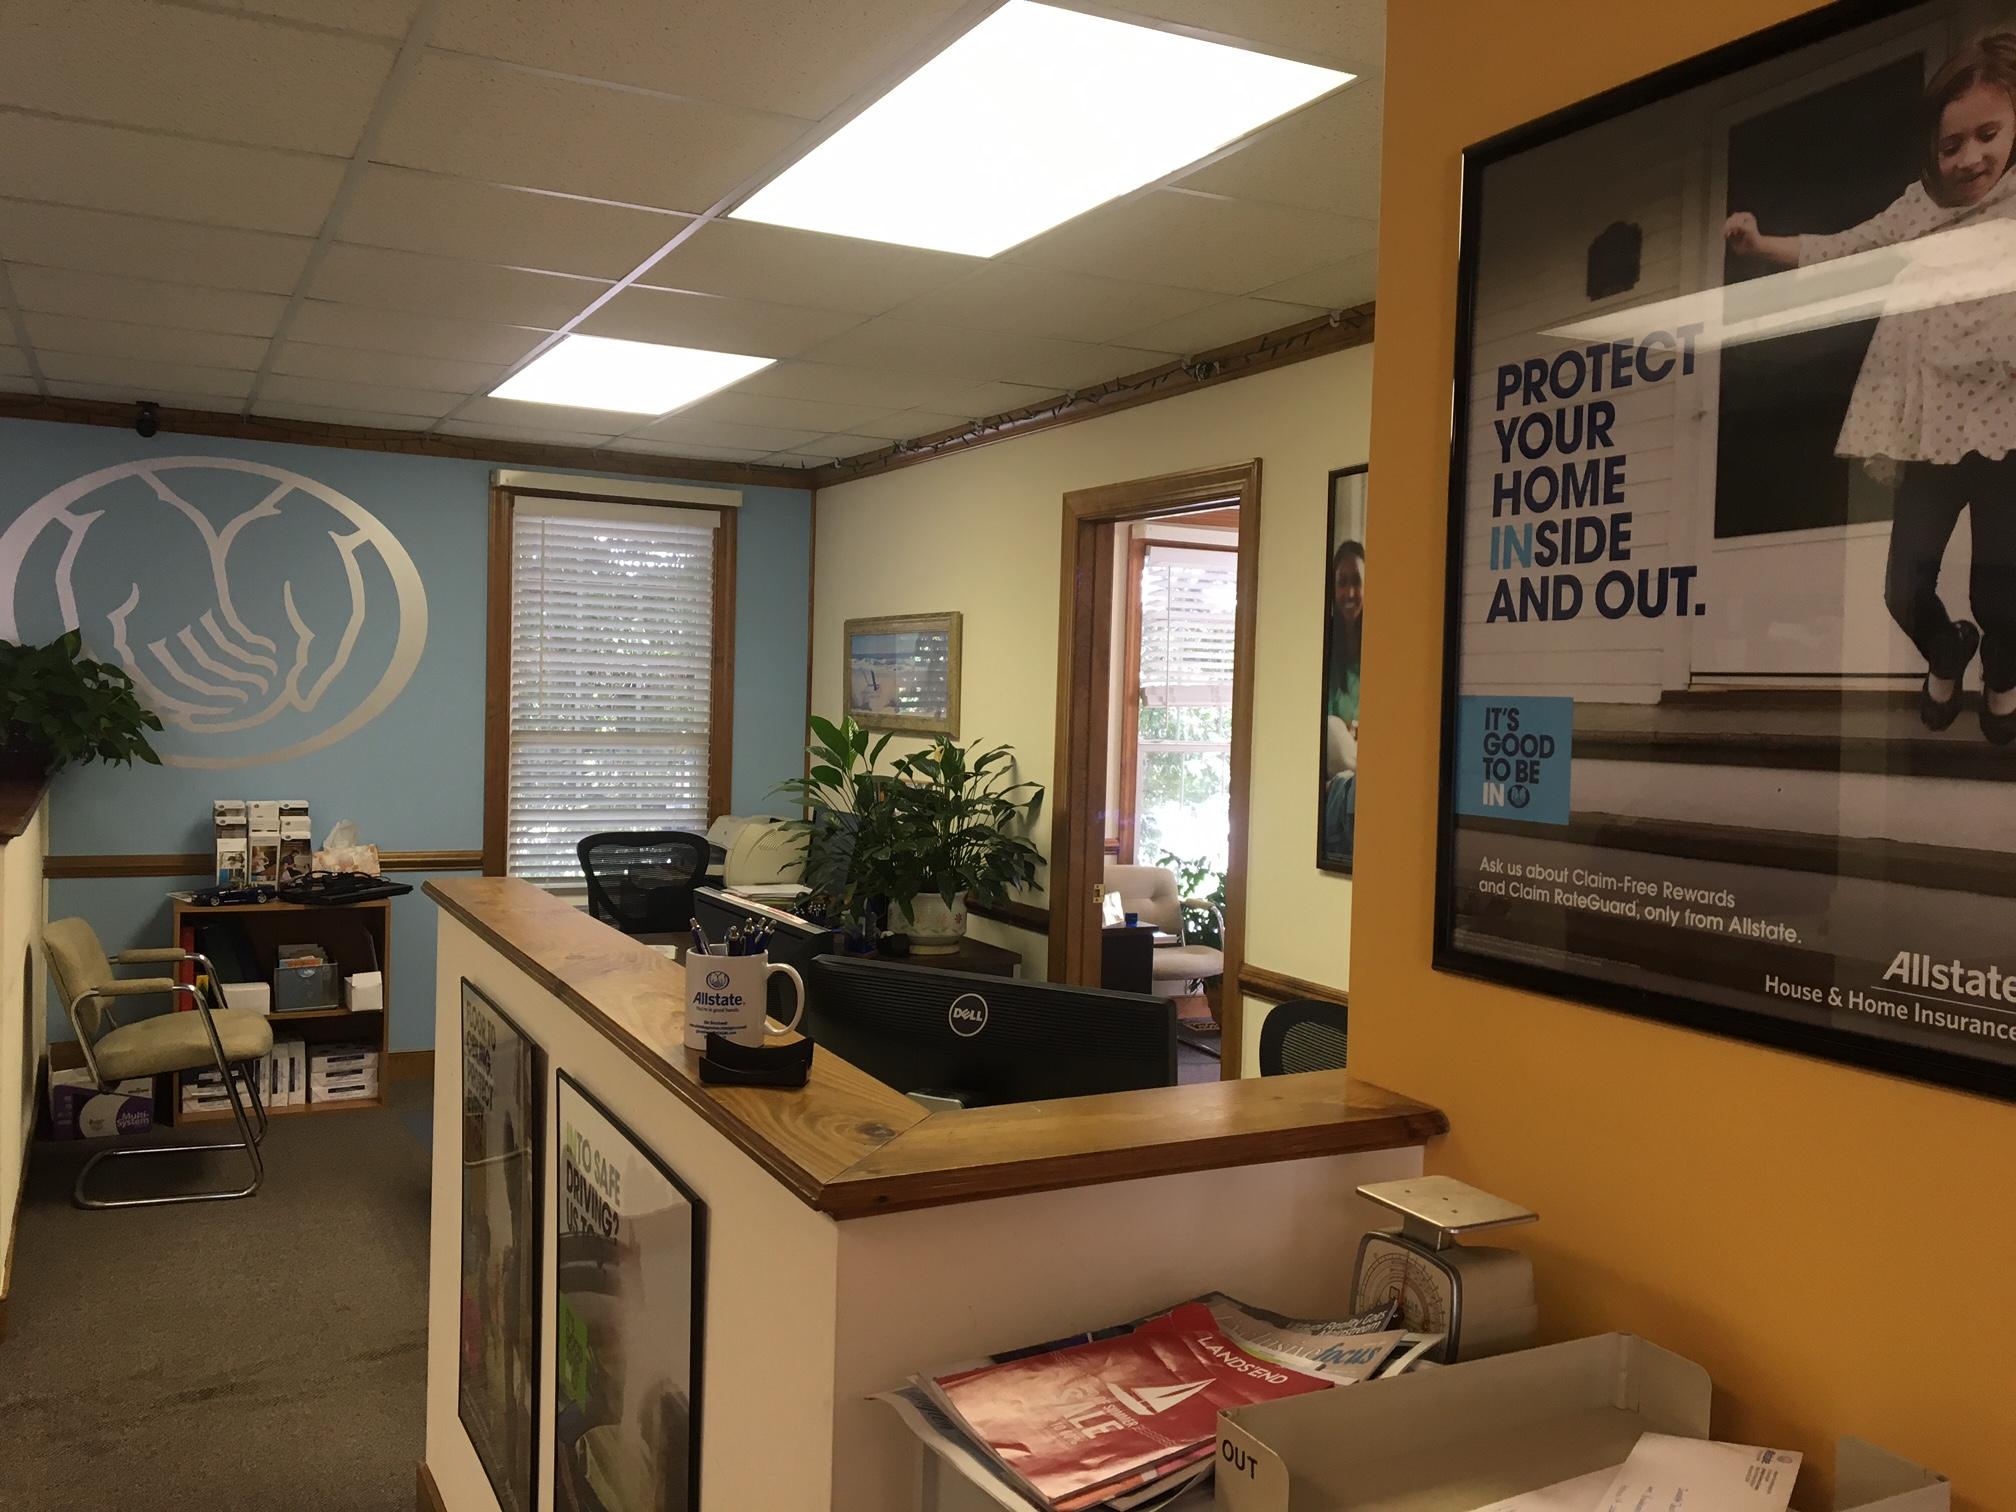 Virginia Brockwell: Allstate Insurance image 4